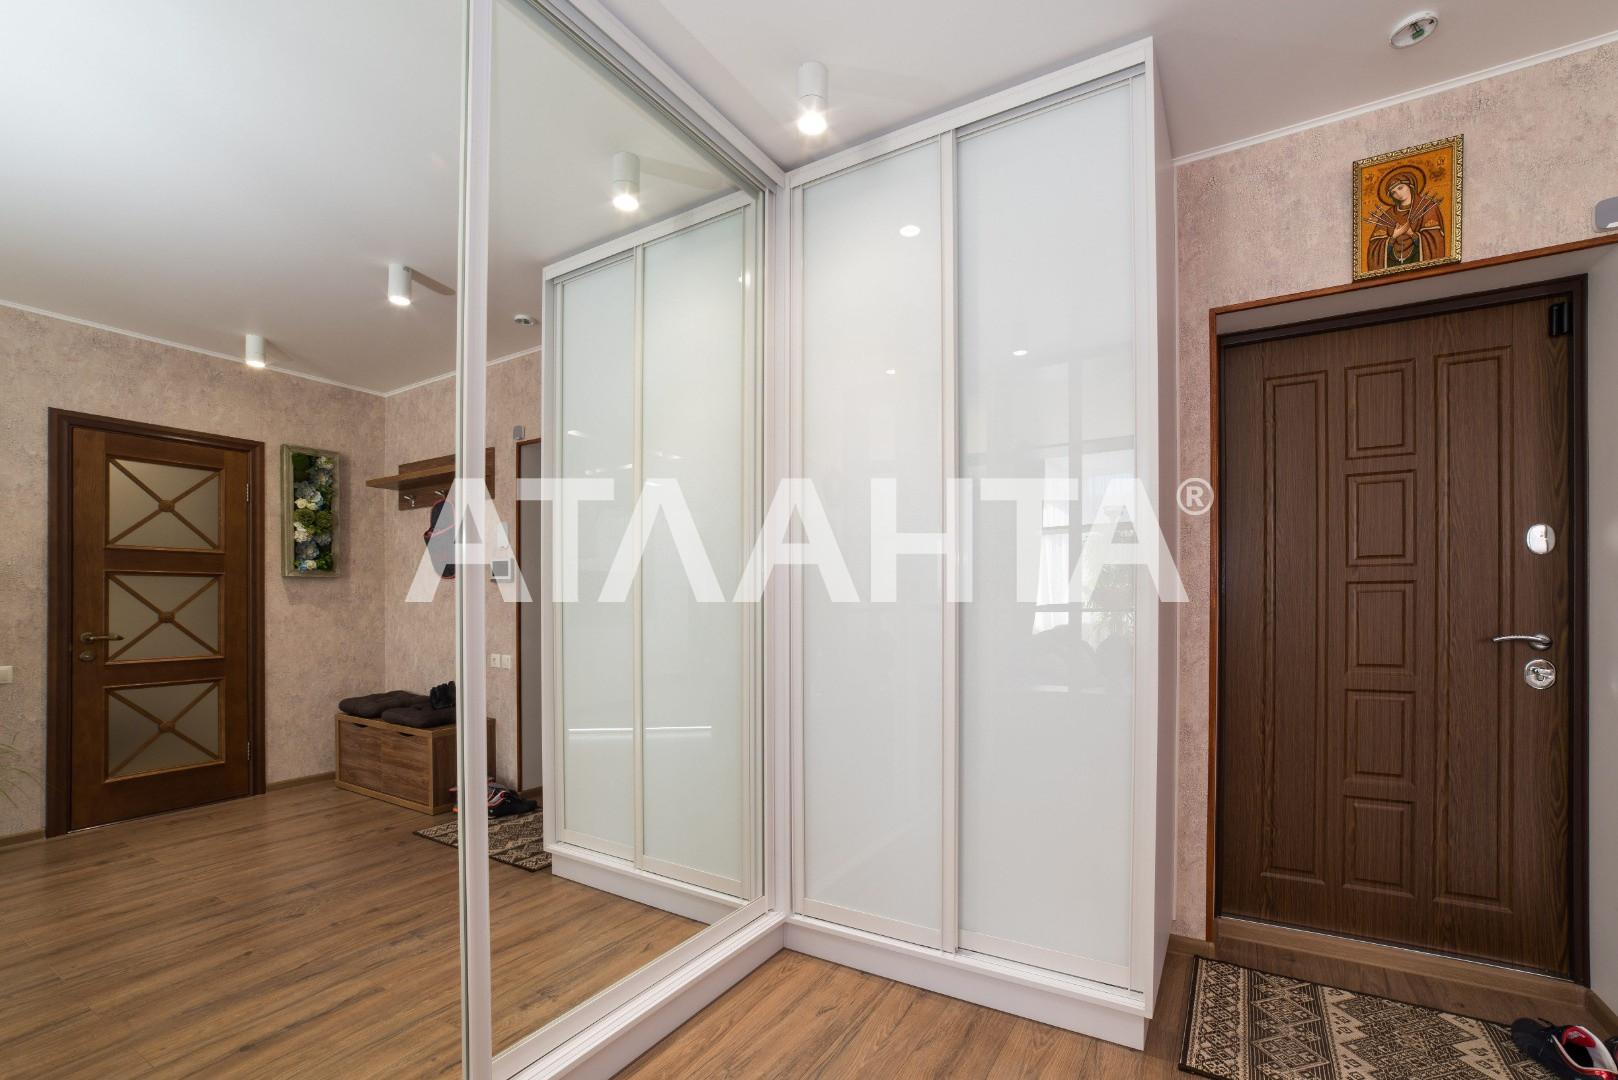 Продается 1-комнатная Квартира на ул. Балковская (Фрунзе) — 50 000 у.е. (фото №17)